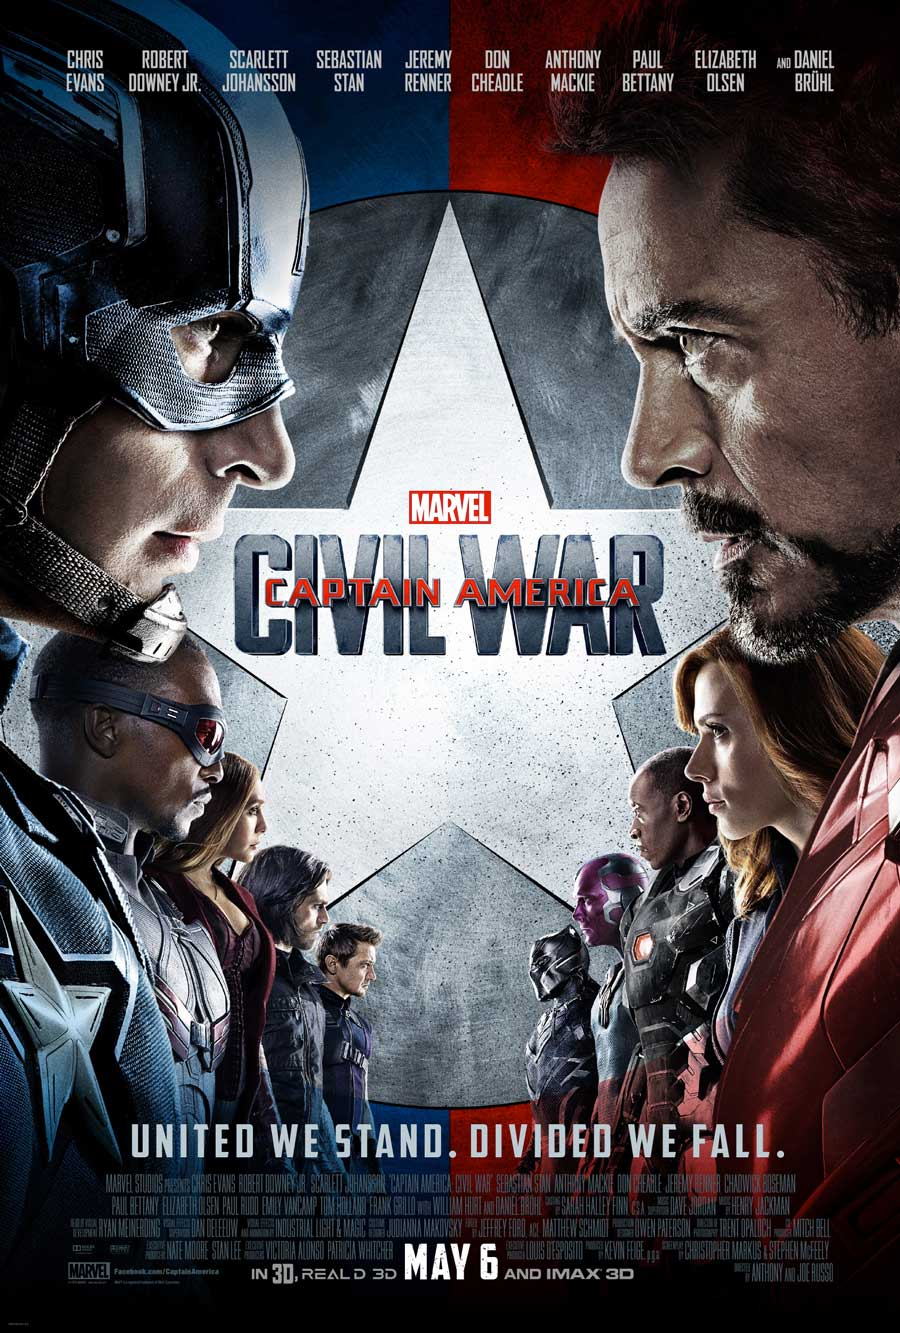 Poster for Captain America: Civil War